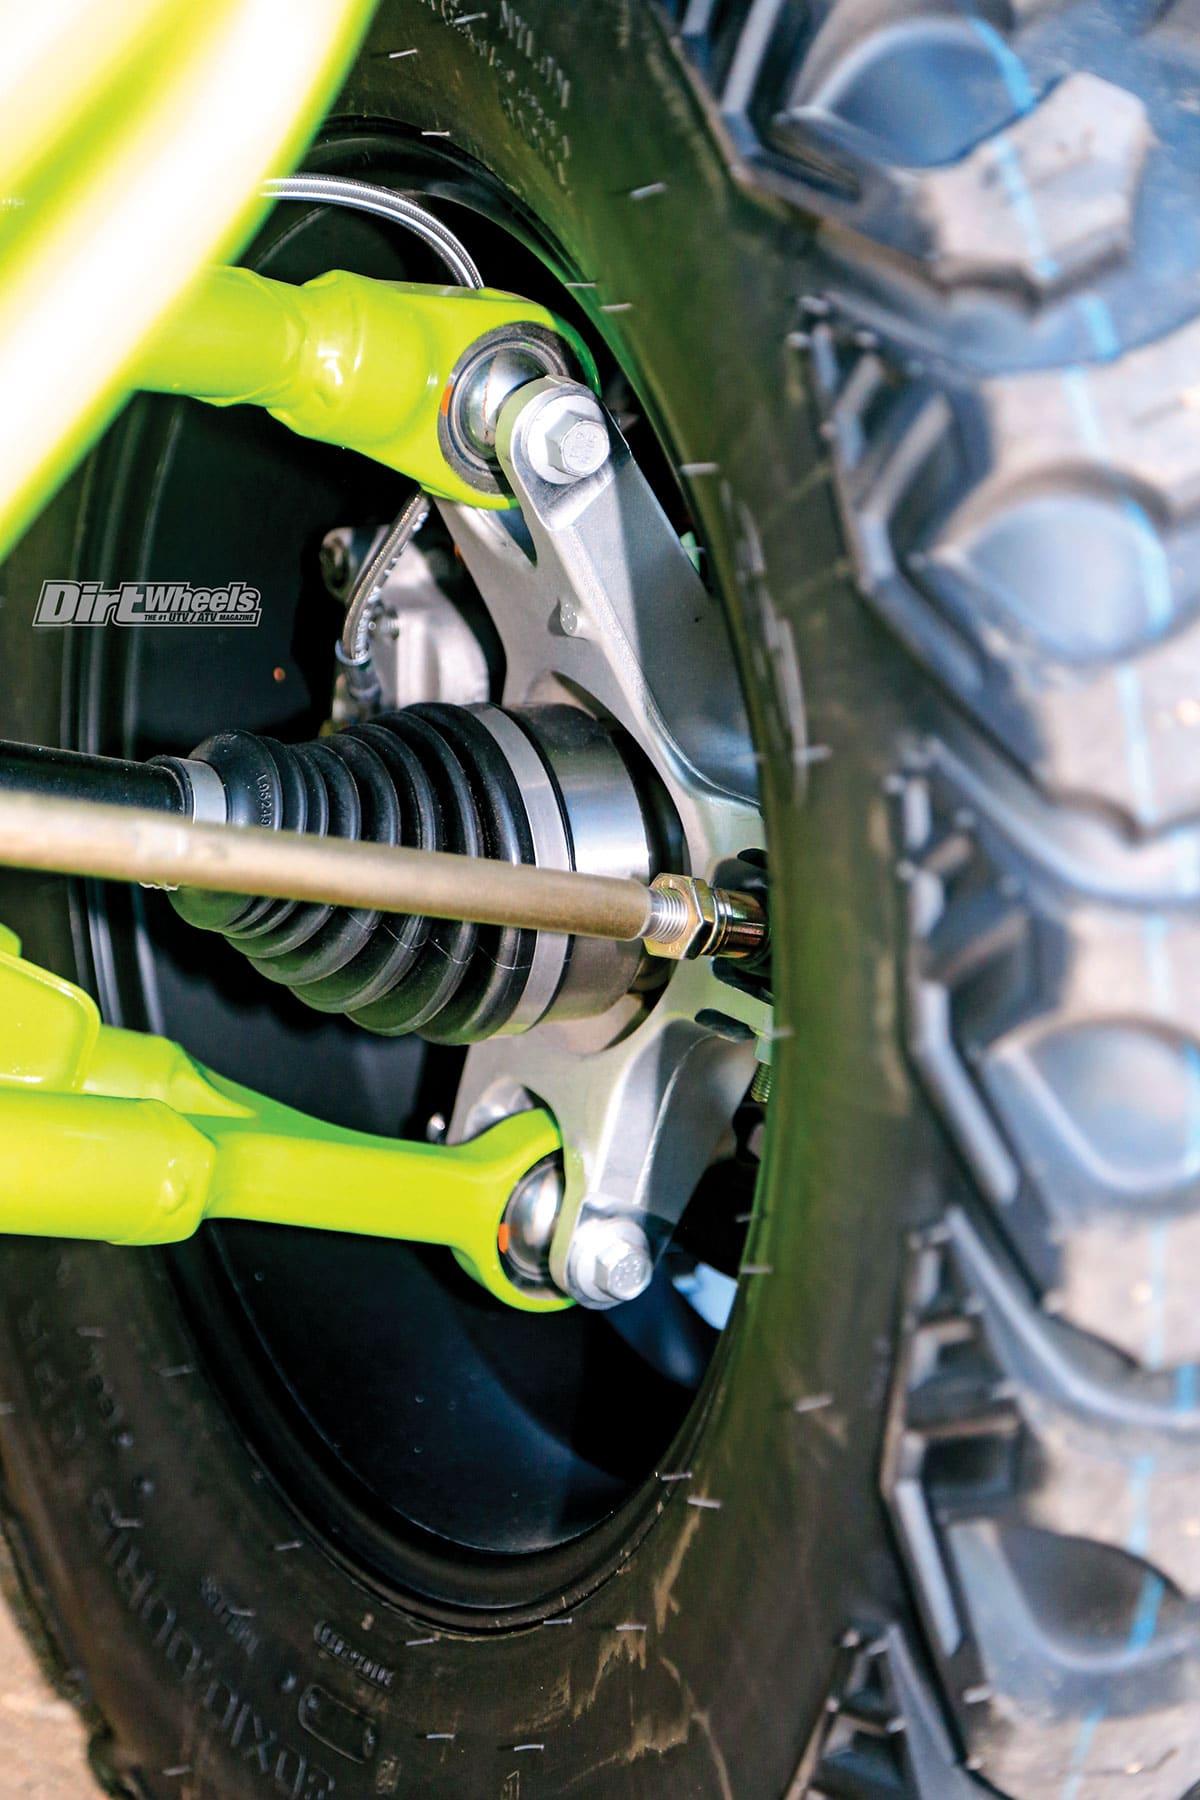 2018 Textron Off Road Wildcat Xx Dirt Wheels Magazine